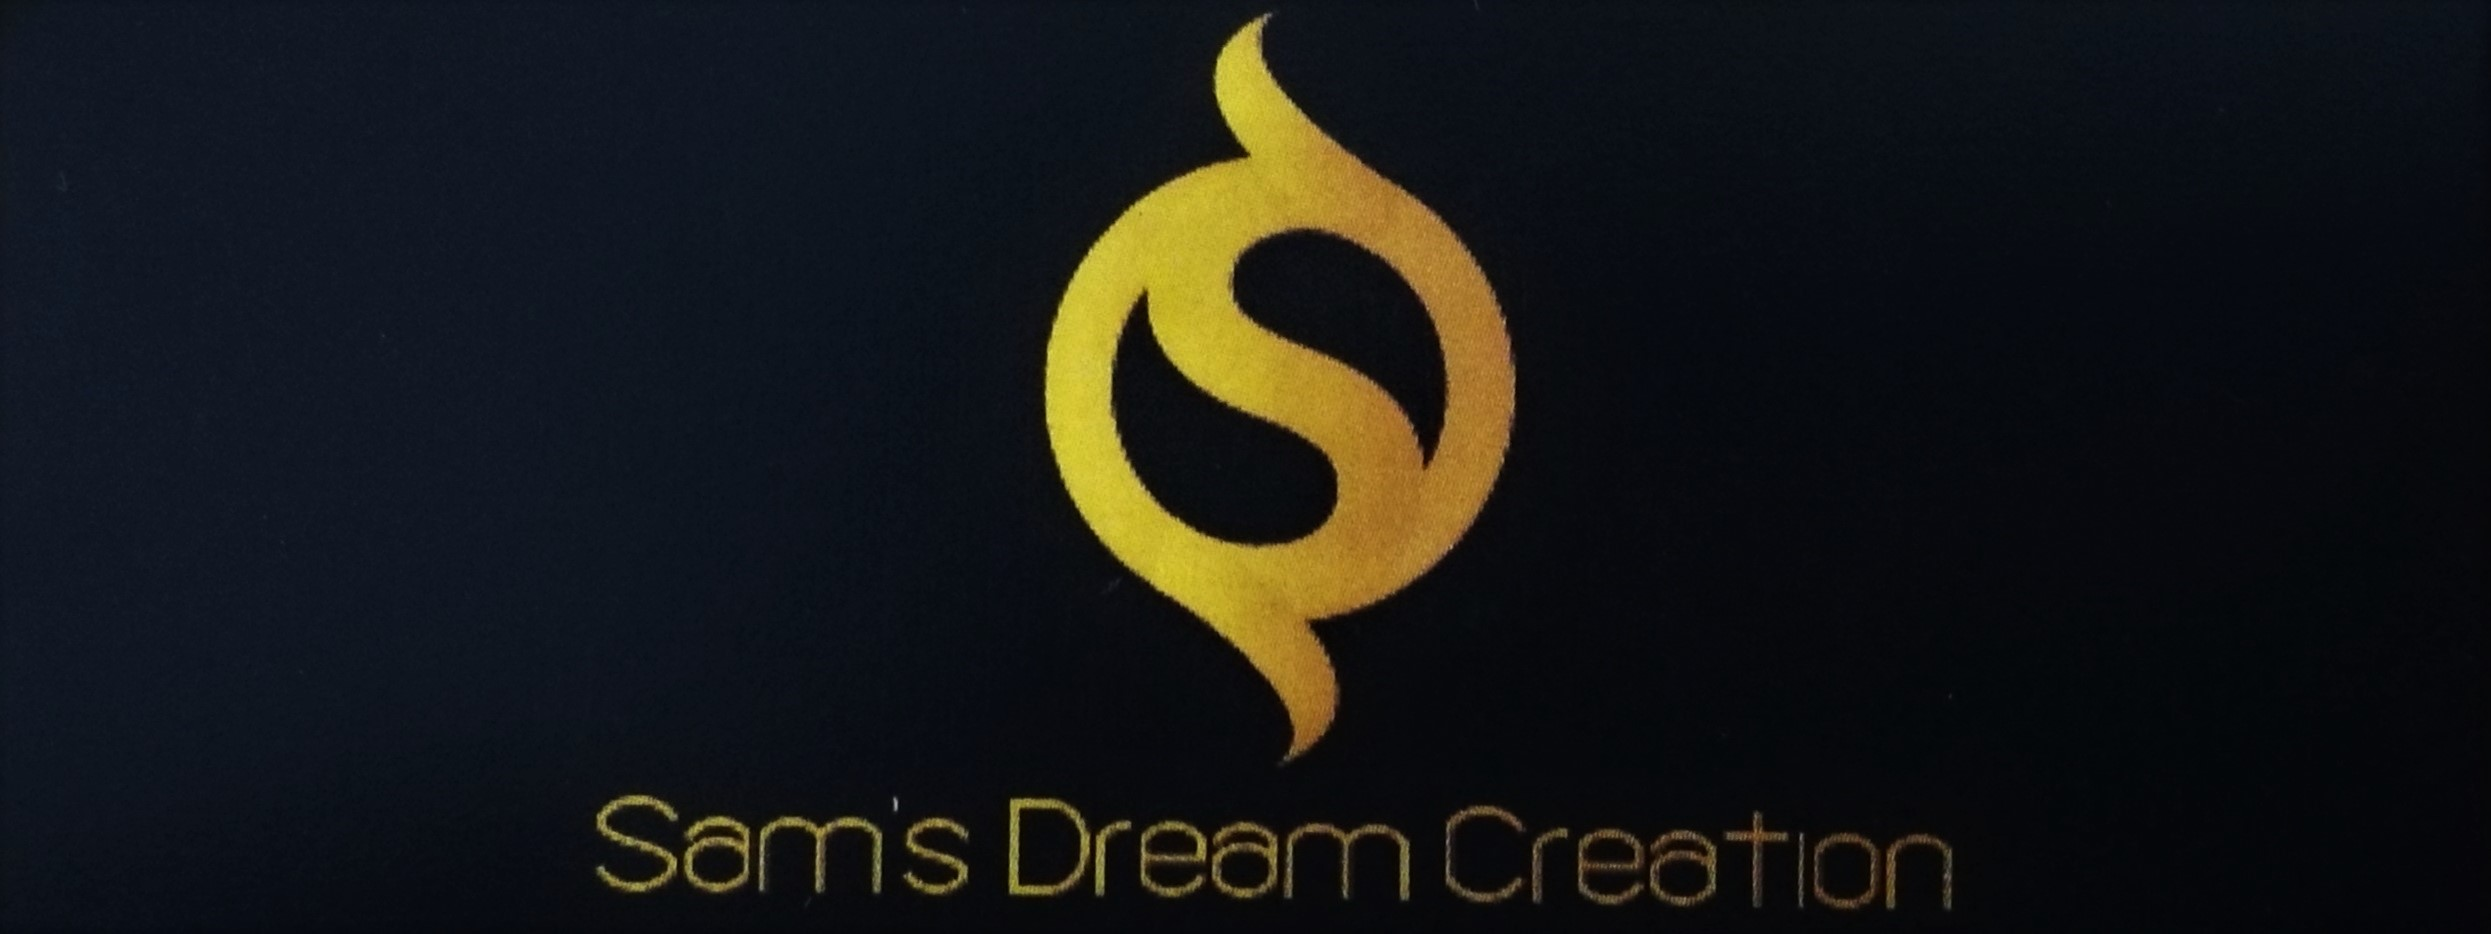 SAM'S DREAM CREATION